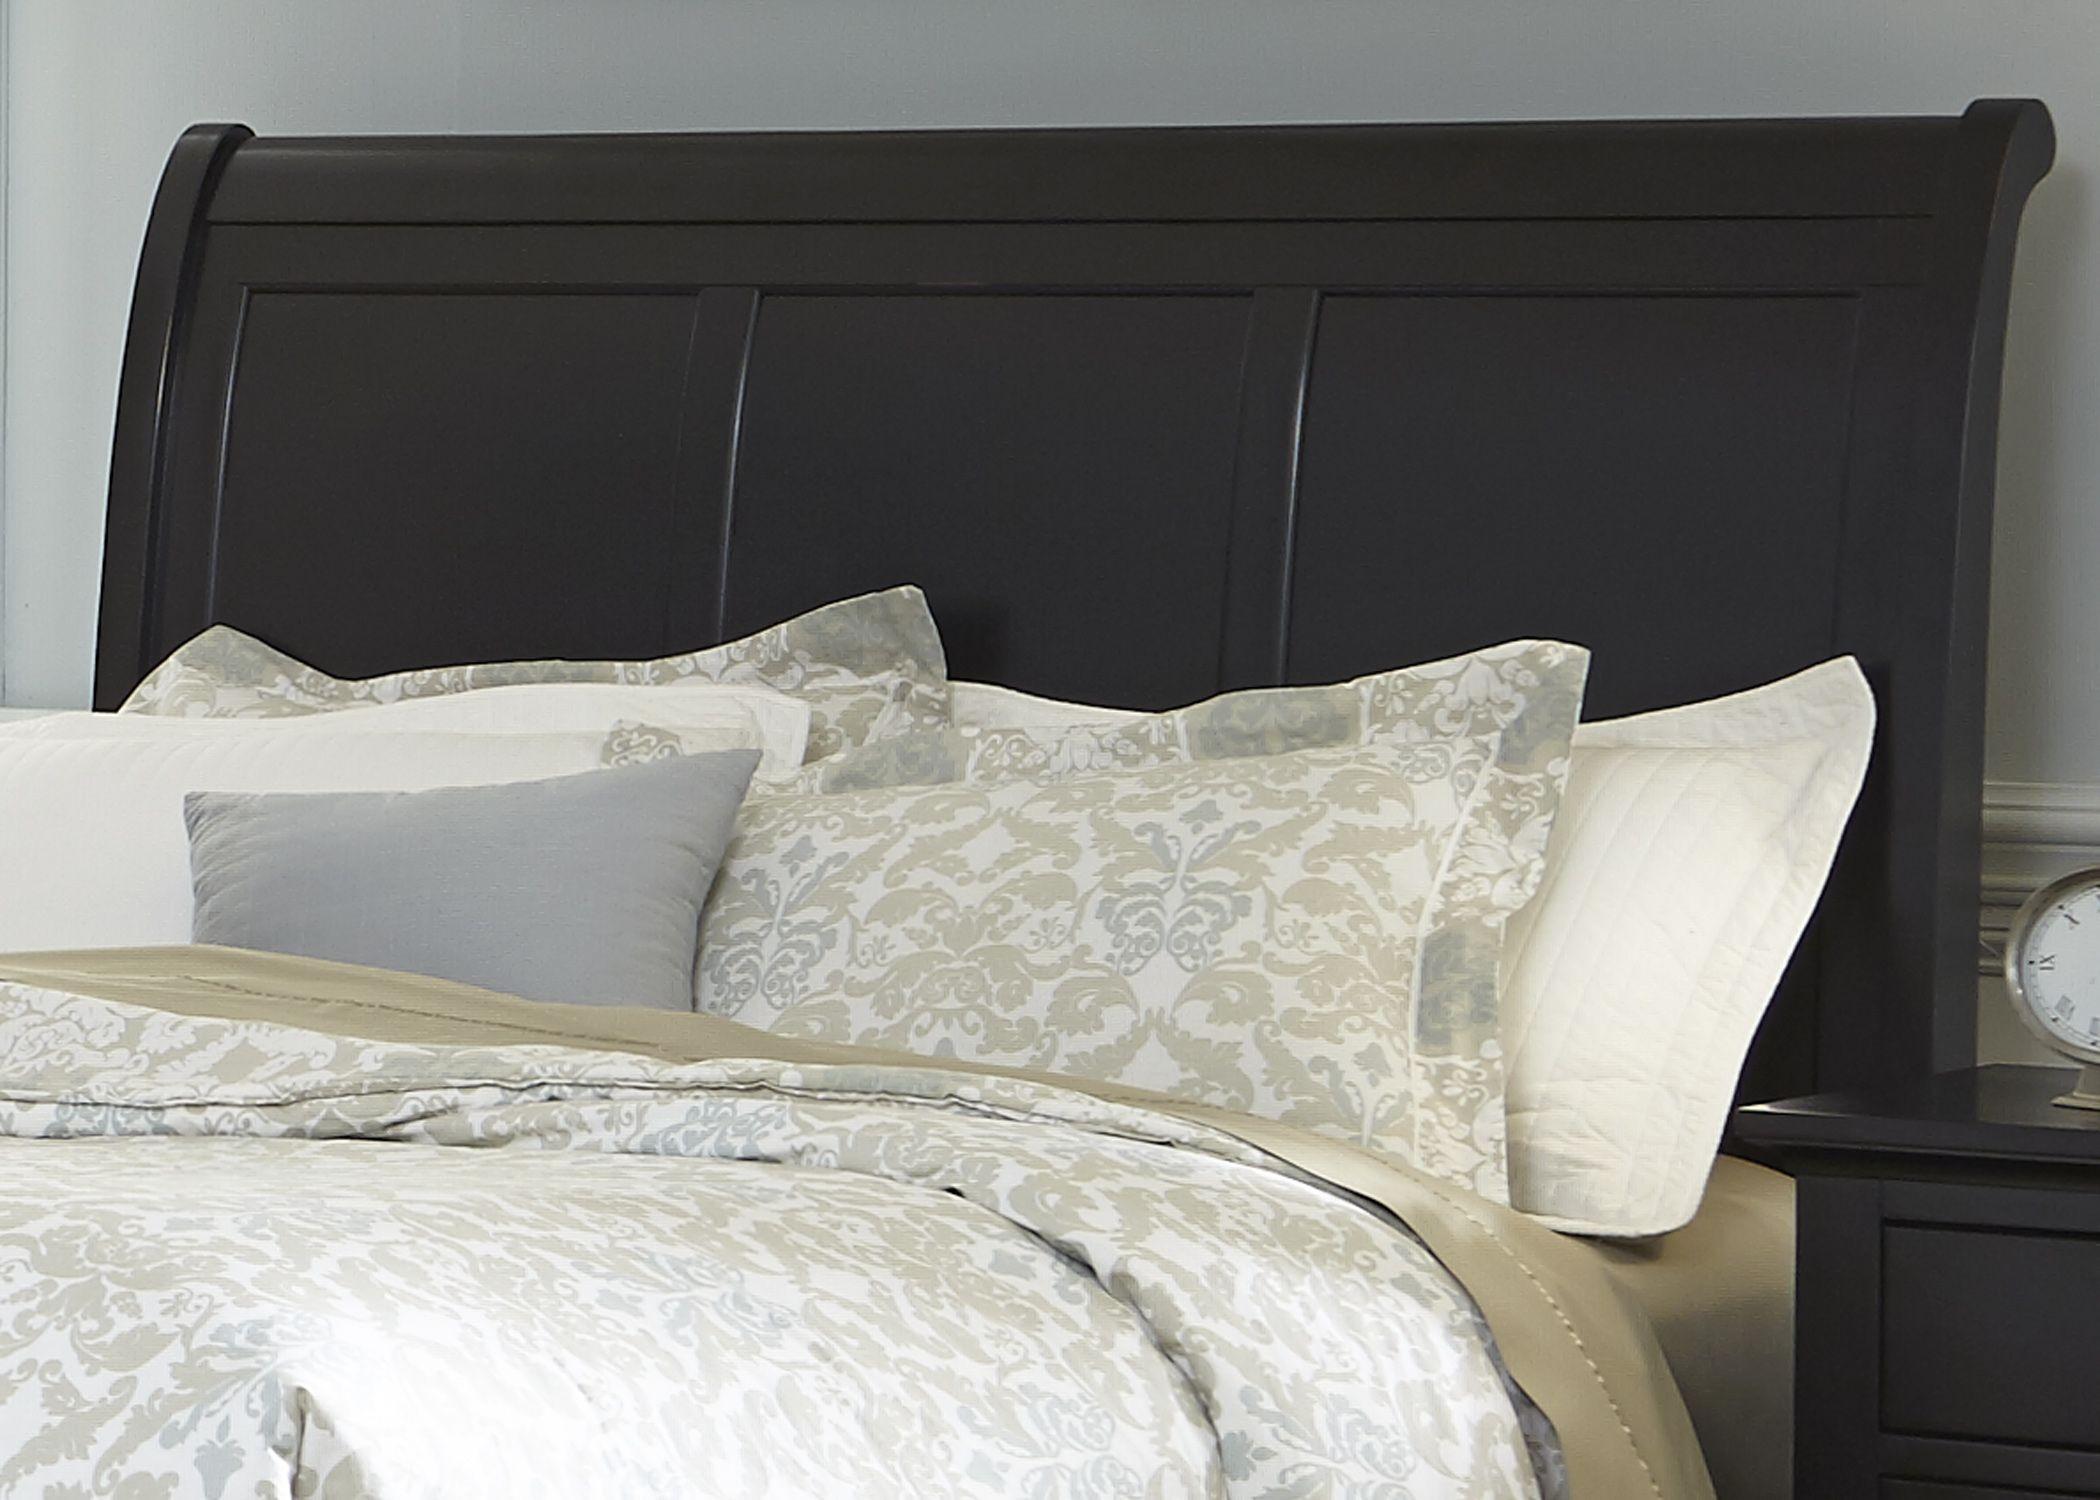 Hamilton III Black Sleigh Bedroom Set from Liberty 441 BR QSL